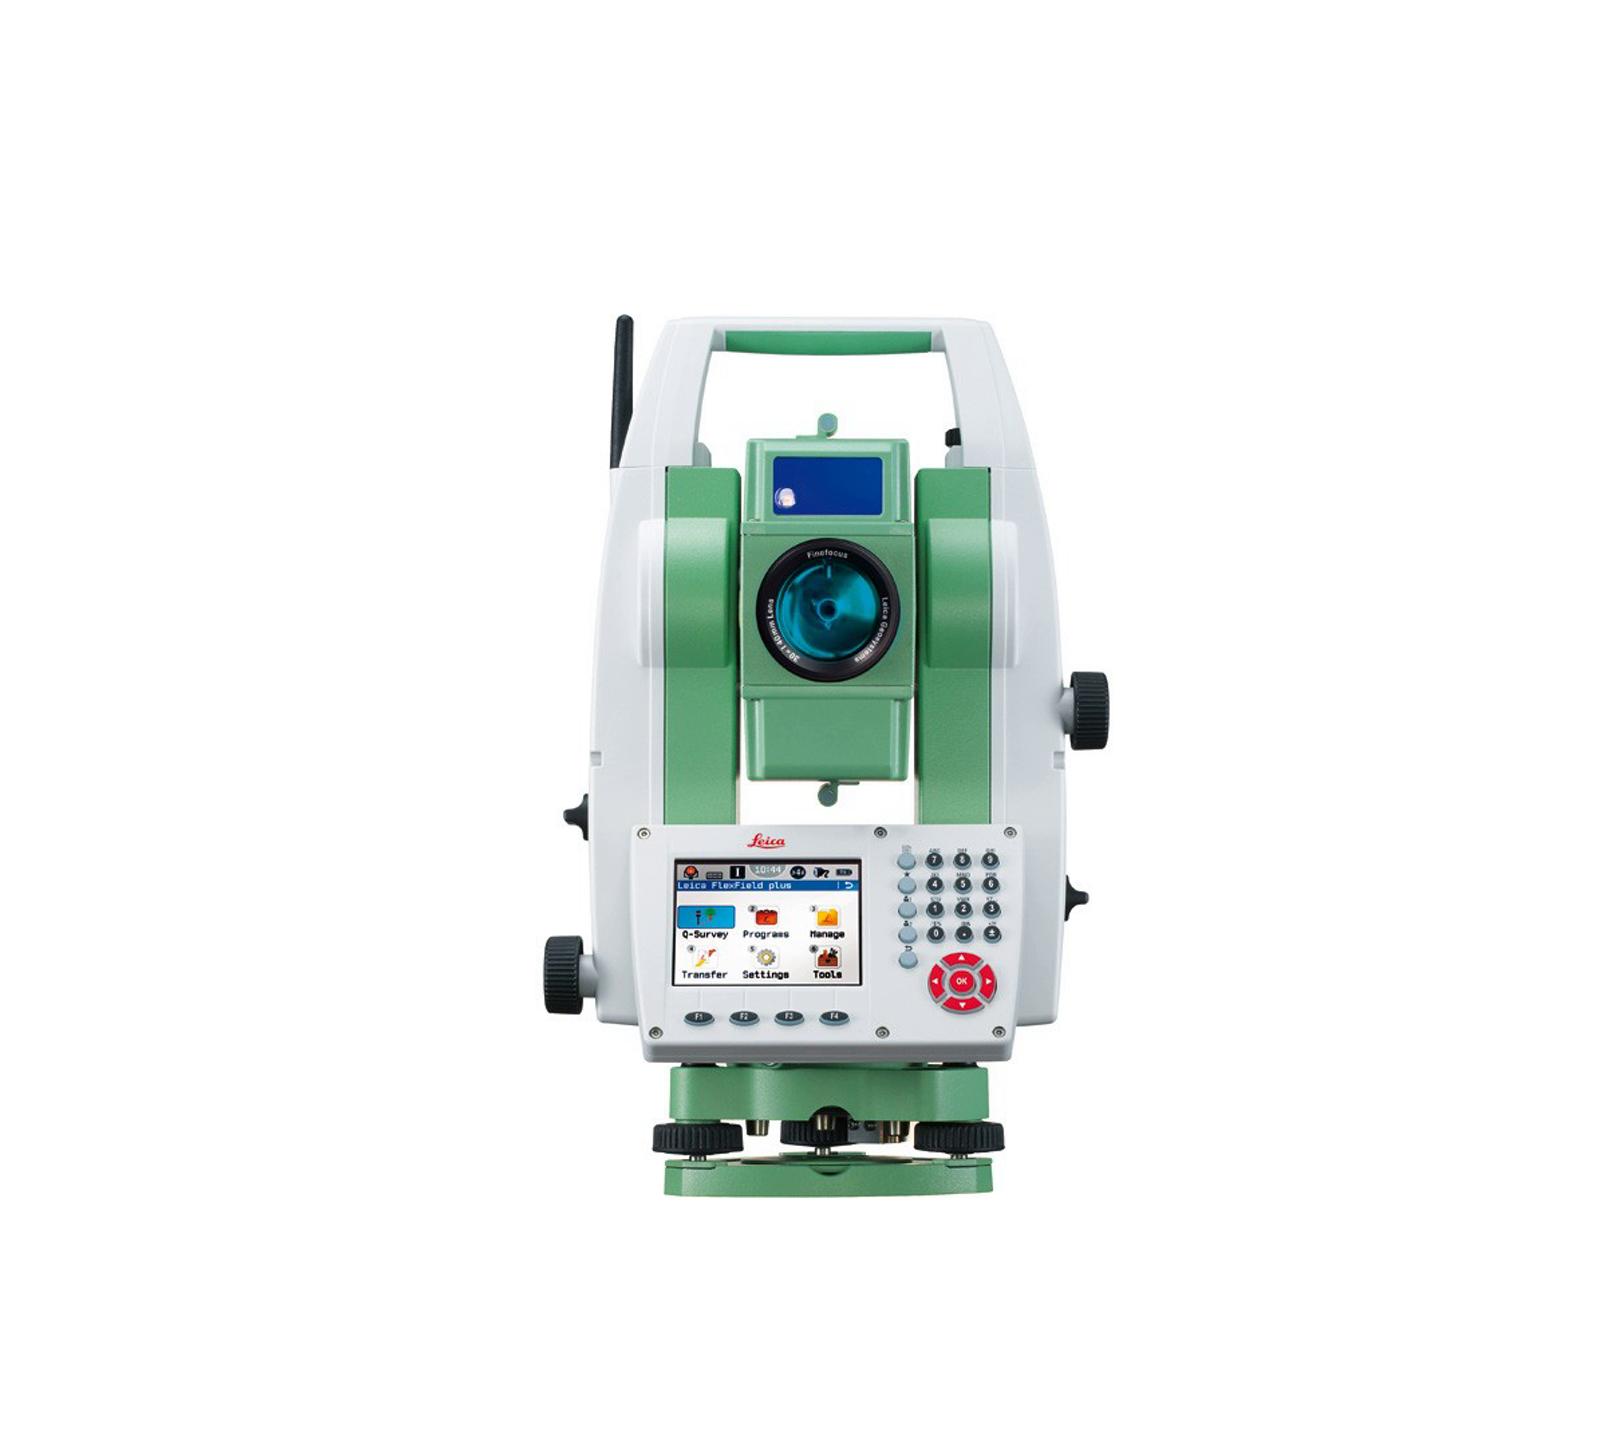 توتال استیشن لیزری - Leica TS09 PLUS R500